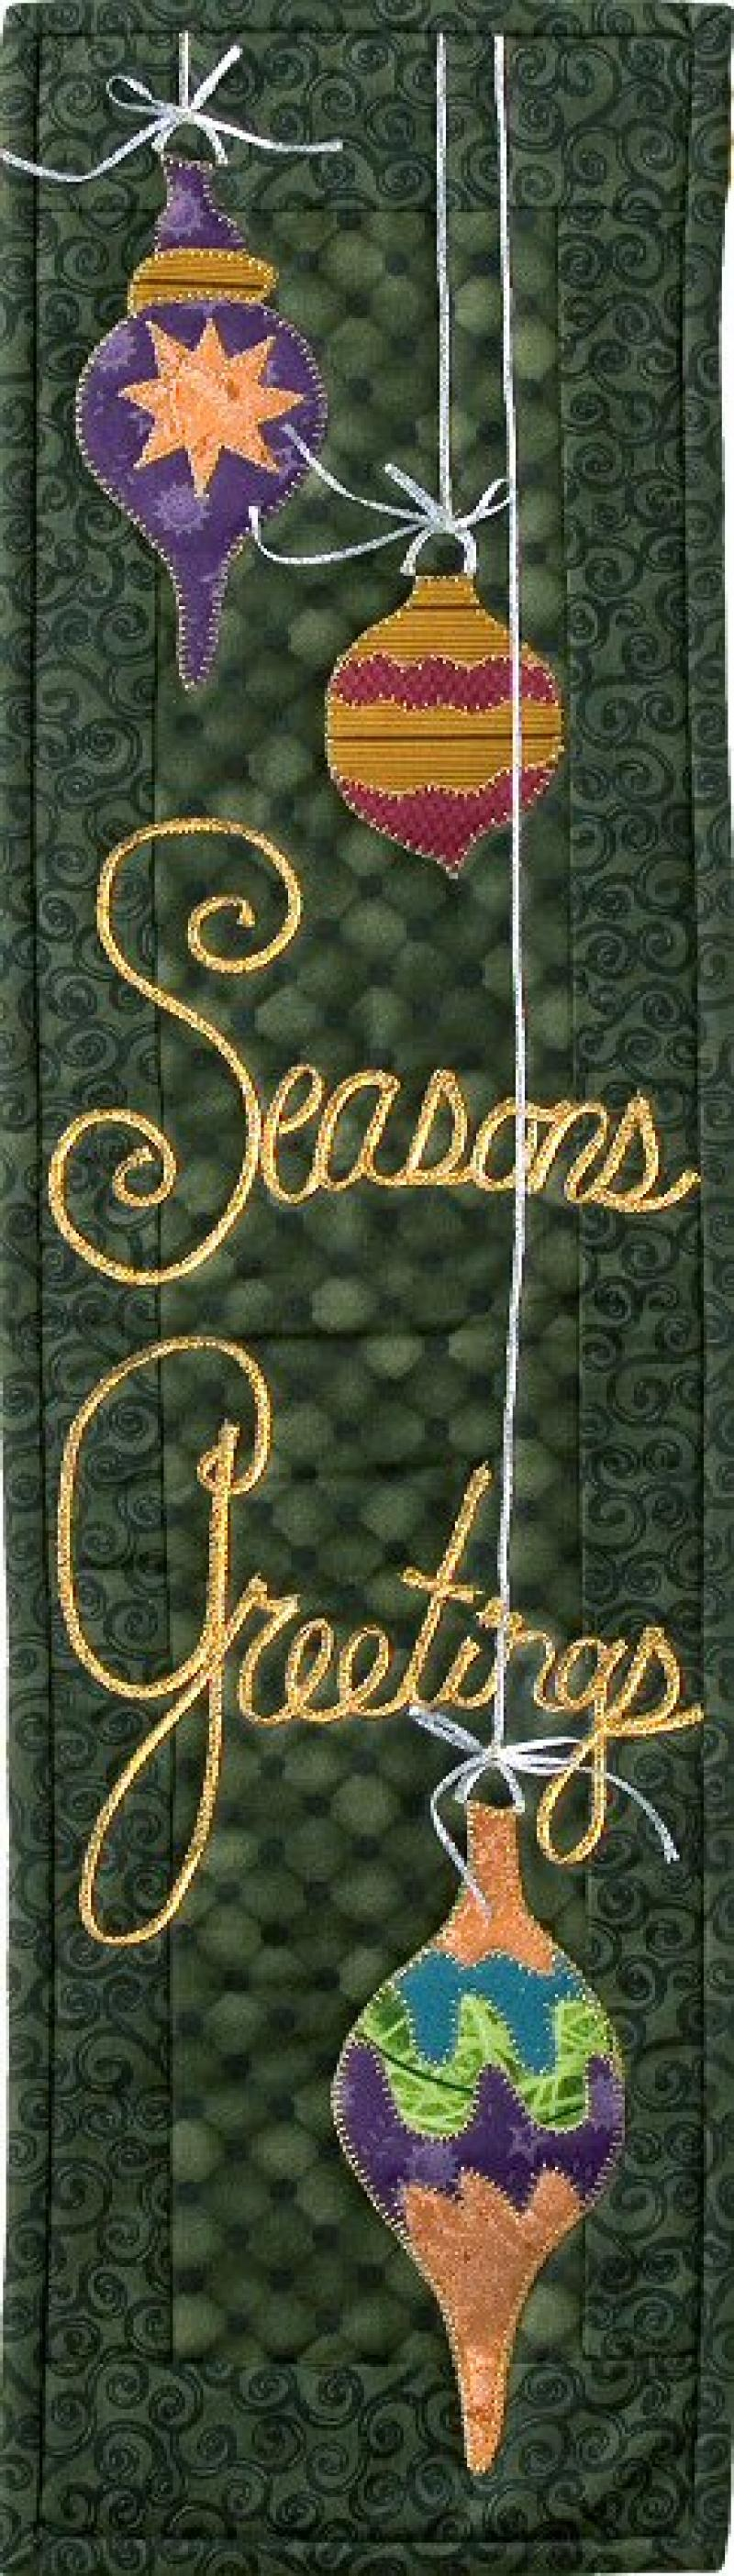 P73 Seasons Greetings